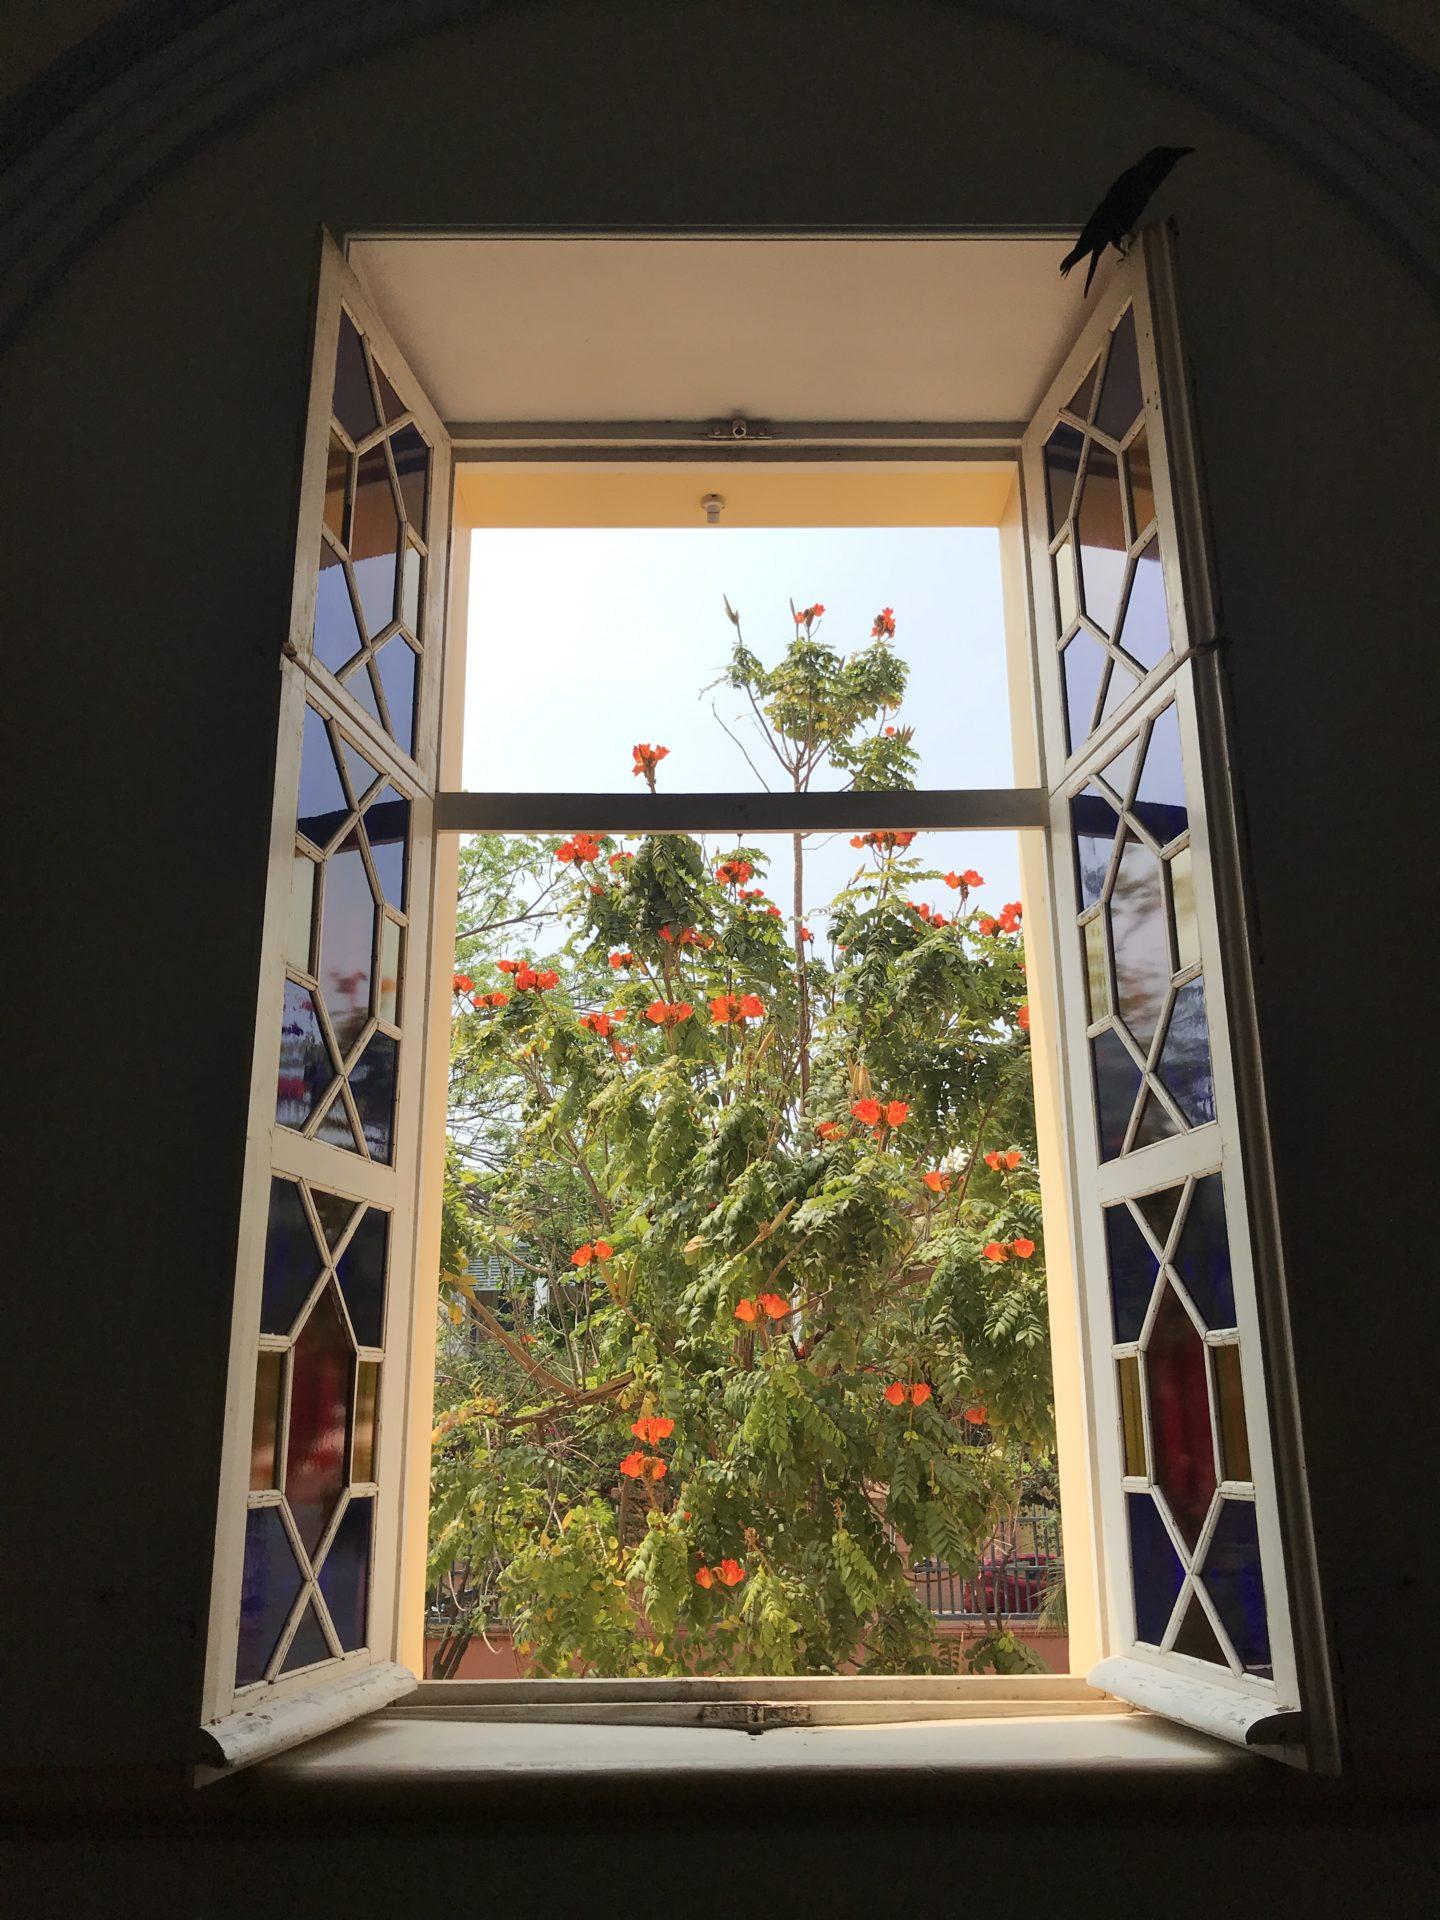 domus dei window